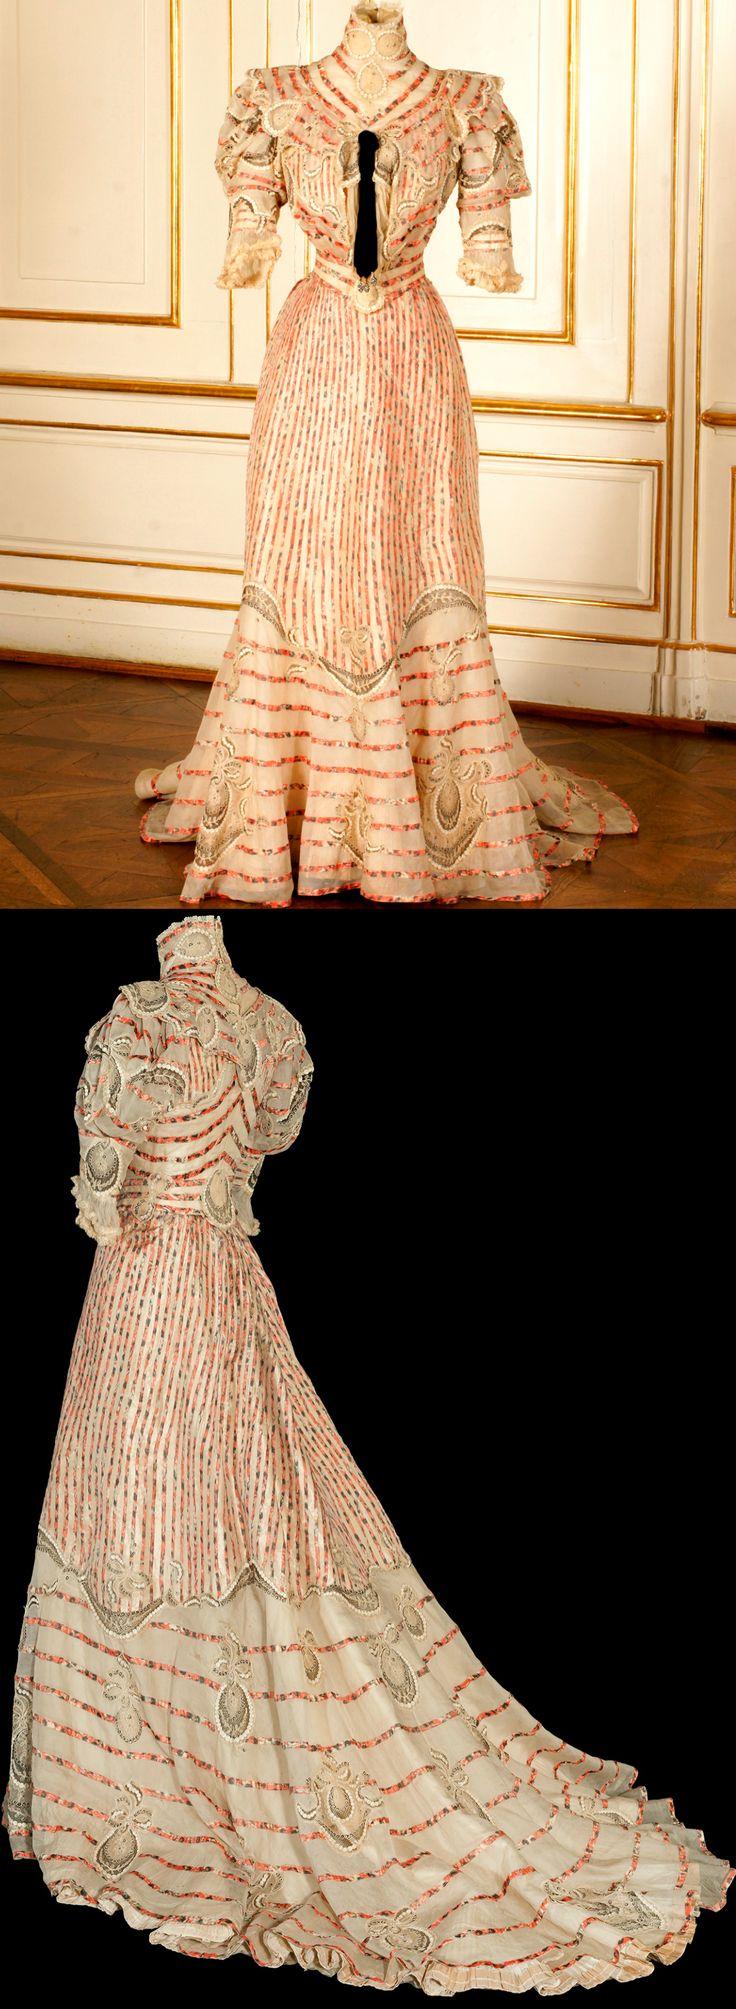 Dress worn by Empress Elisabeth of Austria at her summer home in Corfu. 1890s. Sisi Museum/Hofburg Palace. Photos © Schloß Schönbrunn Kultur - und Betriebsges.m.b.H. / Alexander Eugen Koller.